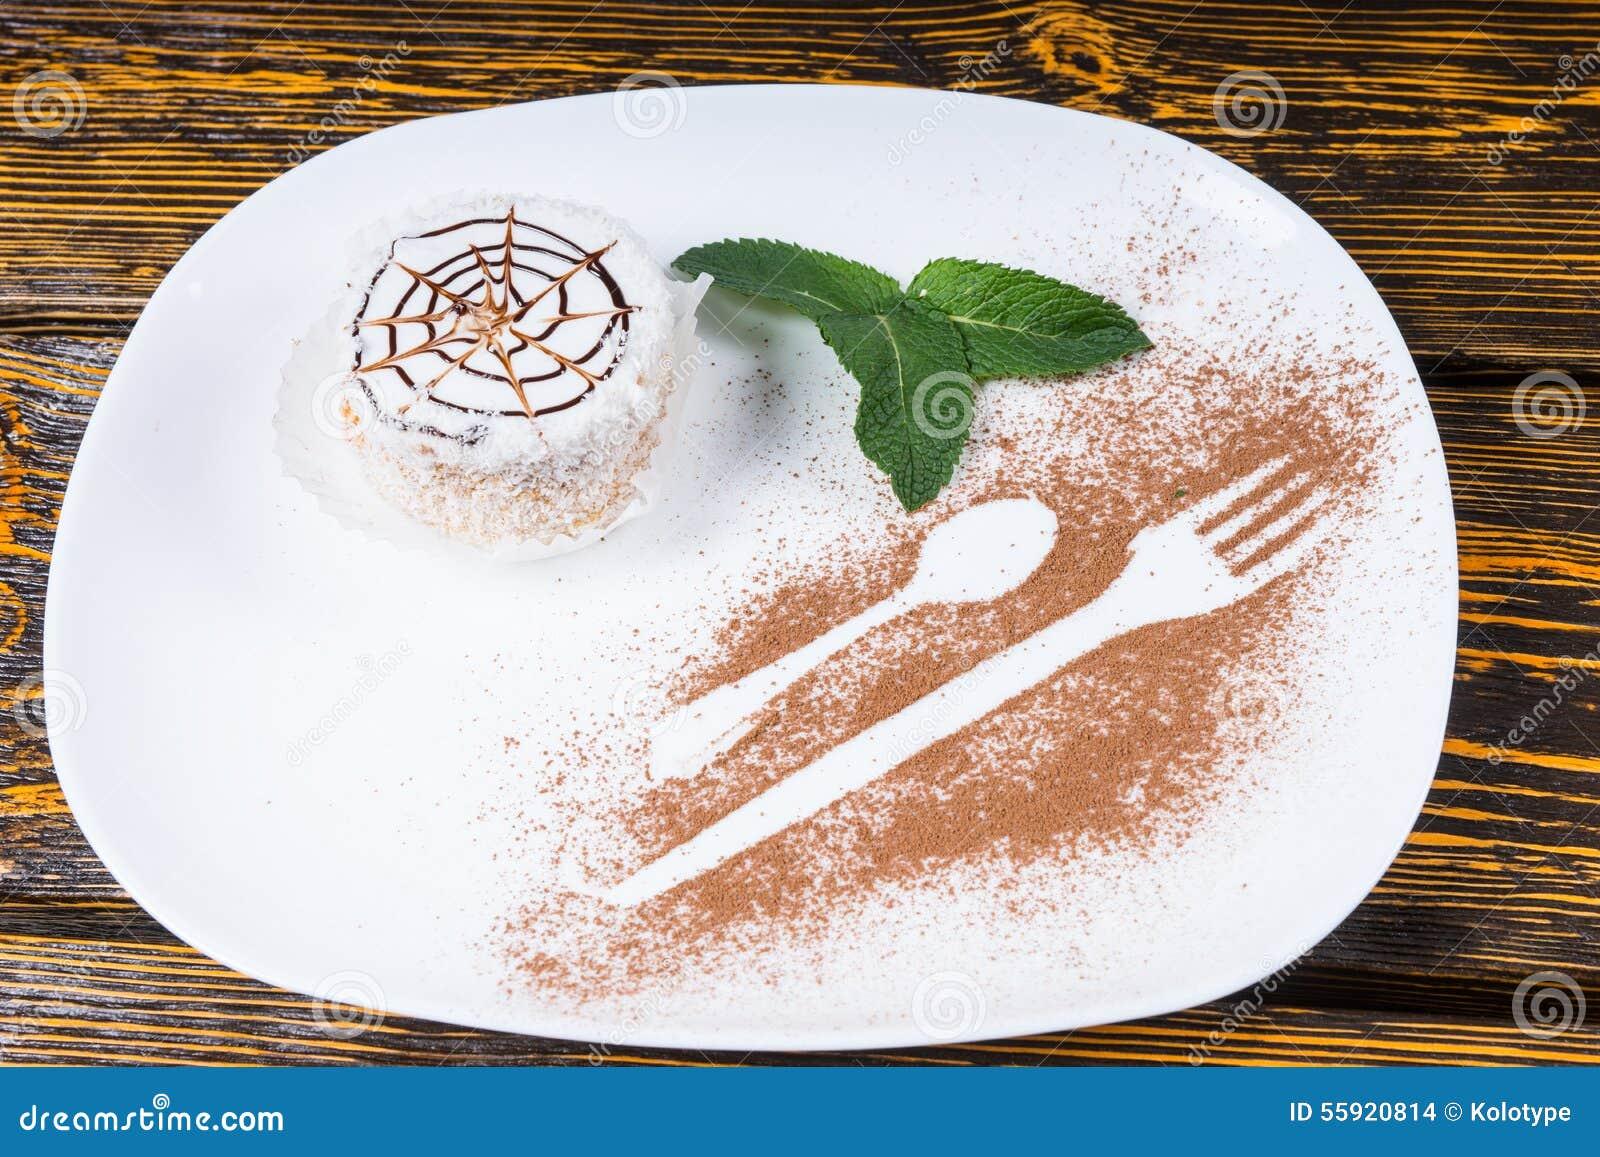 Decadent Individual Dessert With Spider Web Design Stock